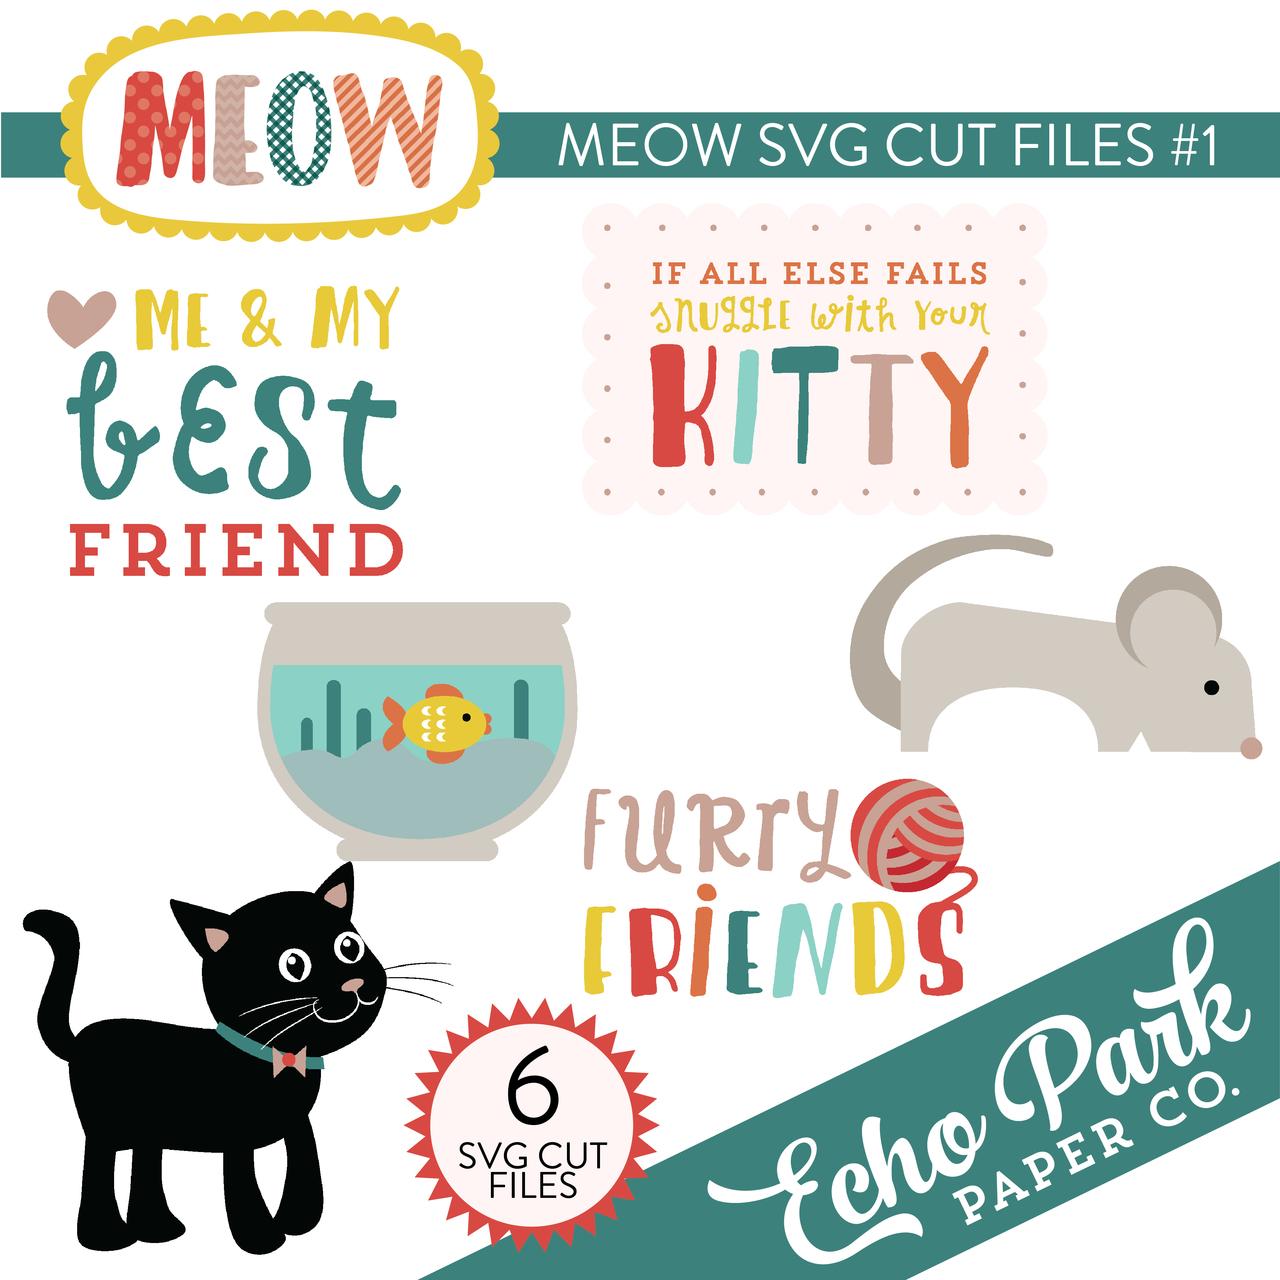 Meow SVG Cut Files #1